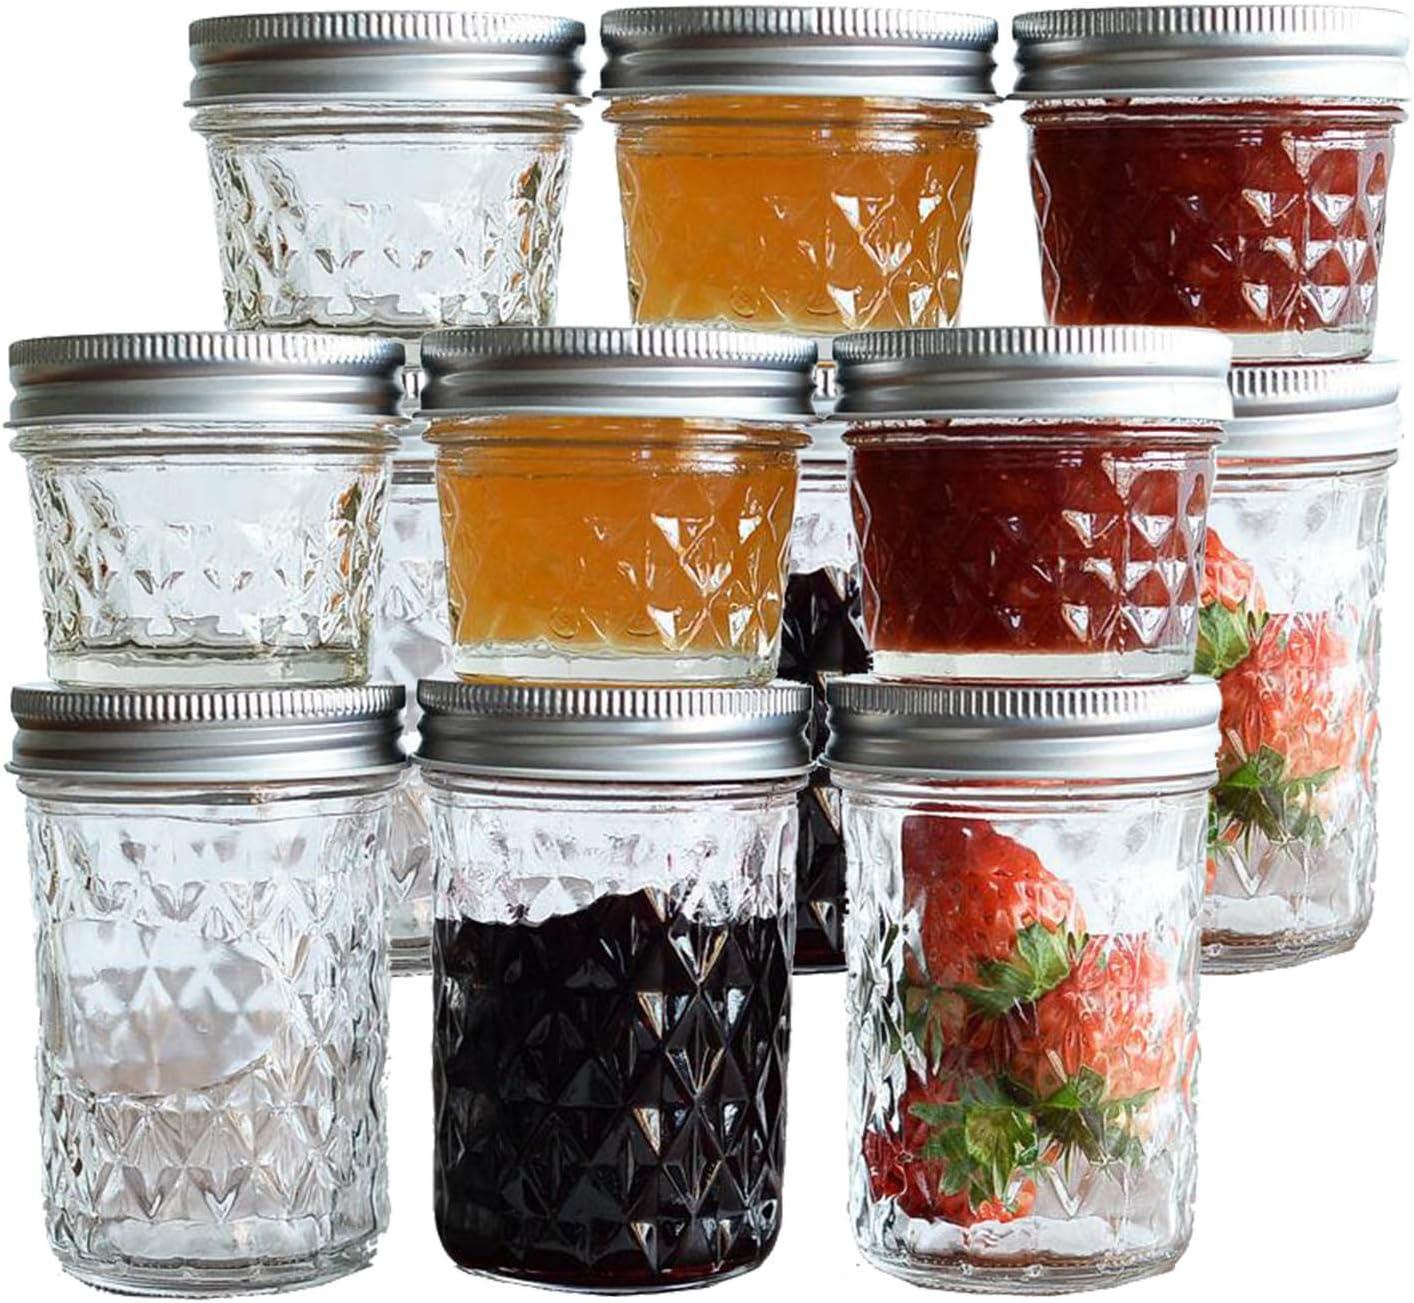 Tebery 12 Pack Mason Jars 8oz & 4oz Canning Jars Jelly Jars With Regular Lids for Jam, Honey, Wedding Favors, Shower Favors, Baby Foods